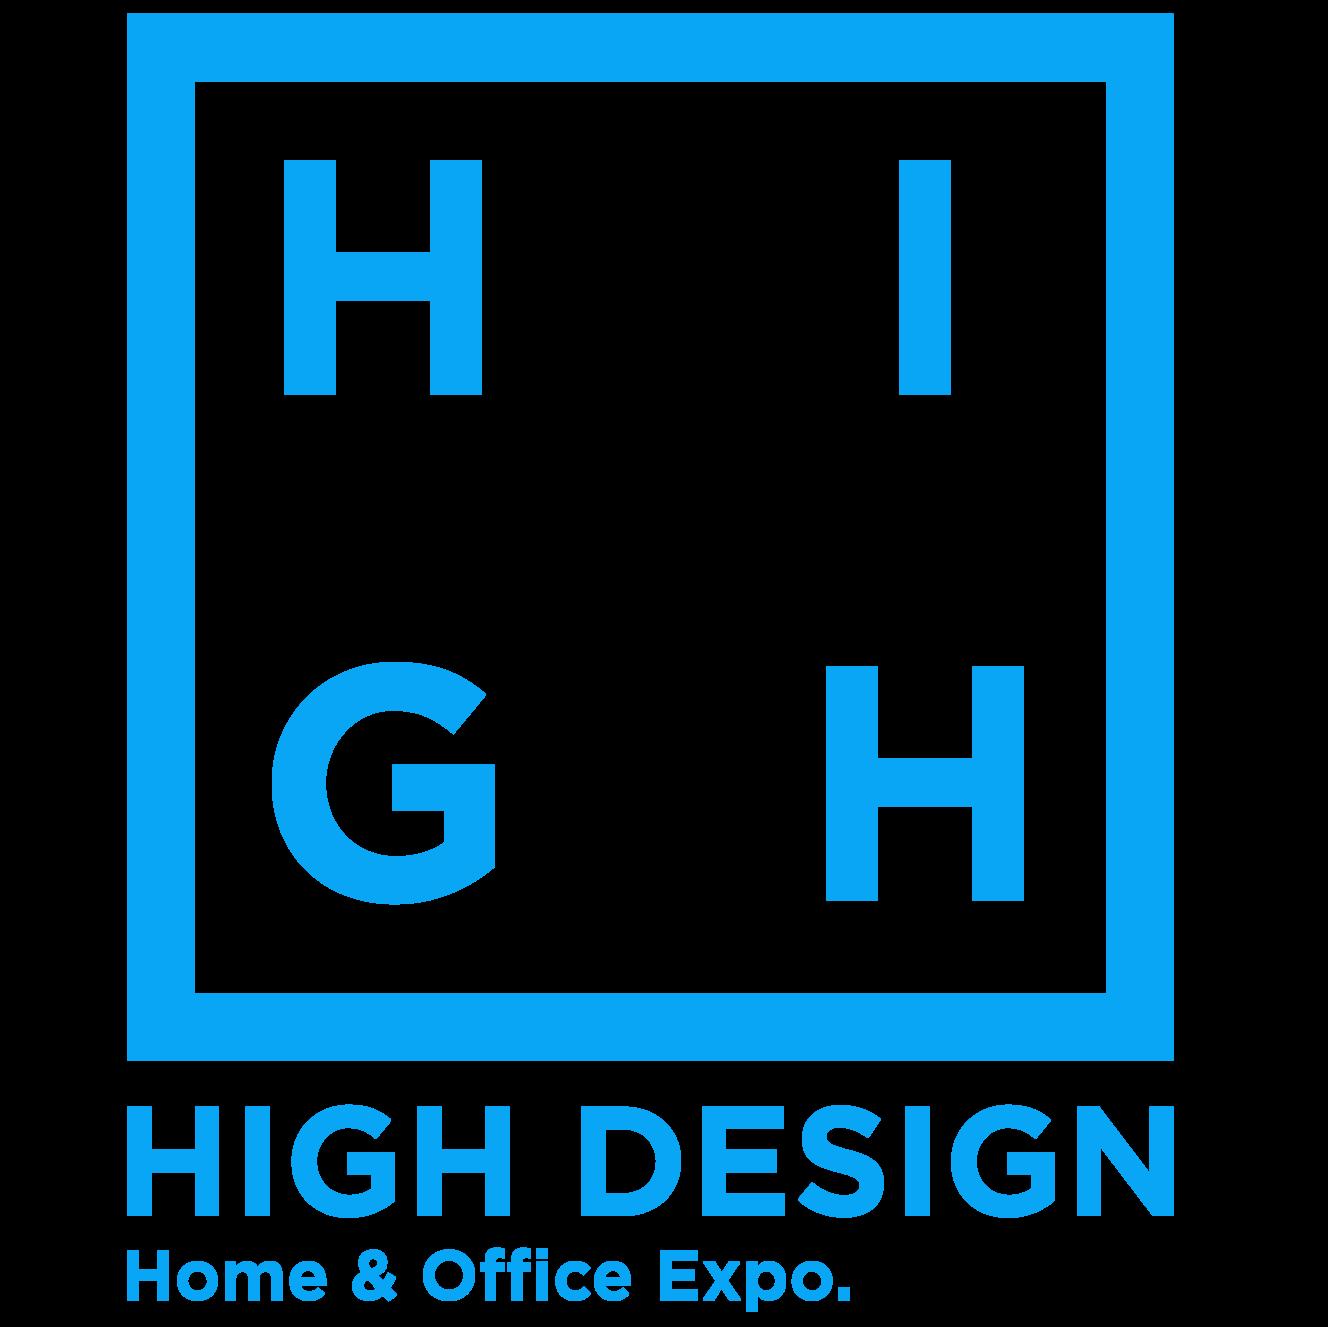 High Design Home & Office Expo 2016